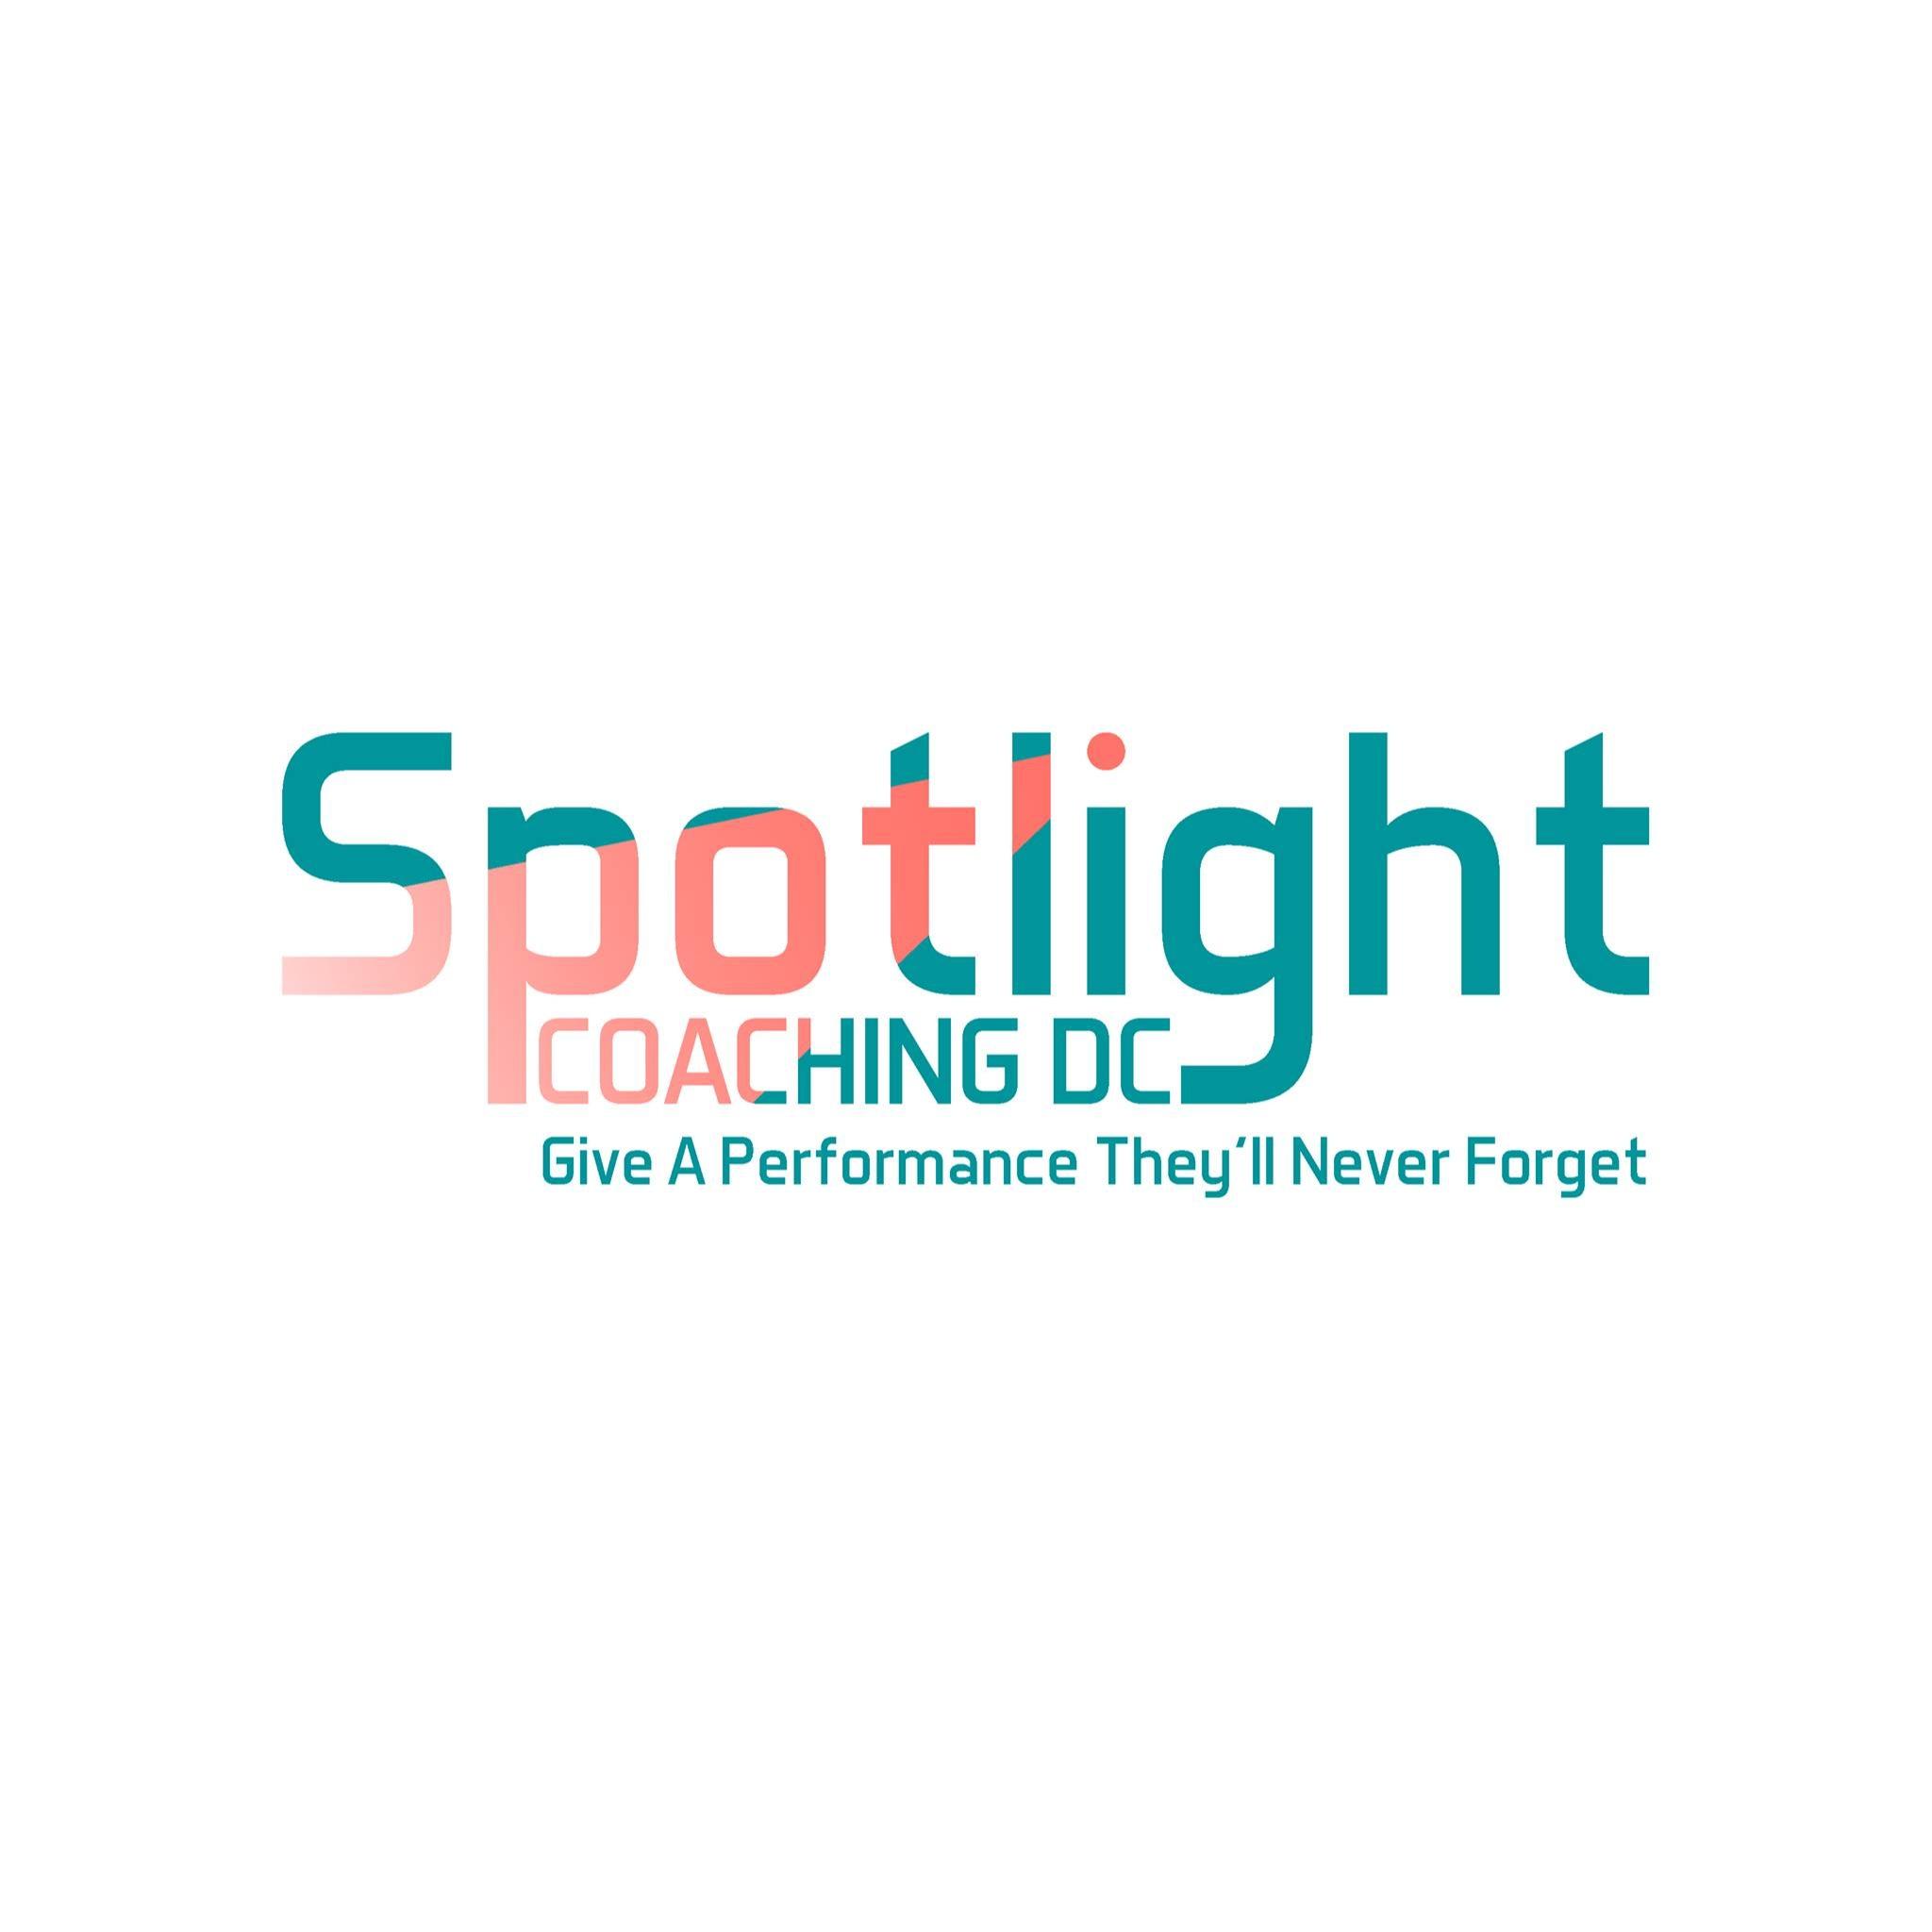 Spotlight Coaching DC